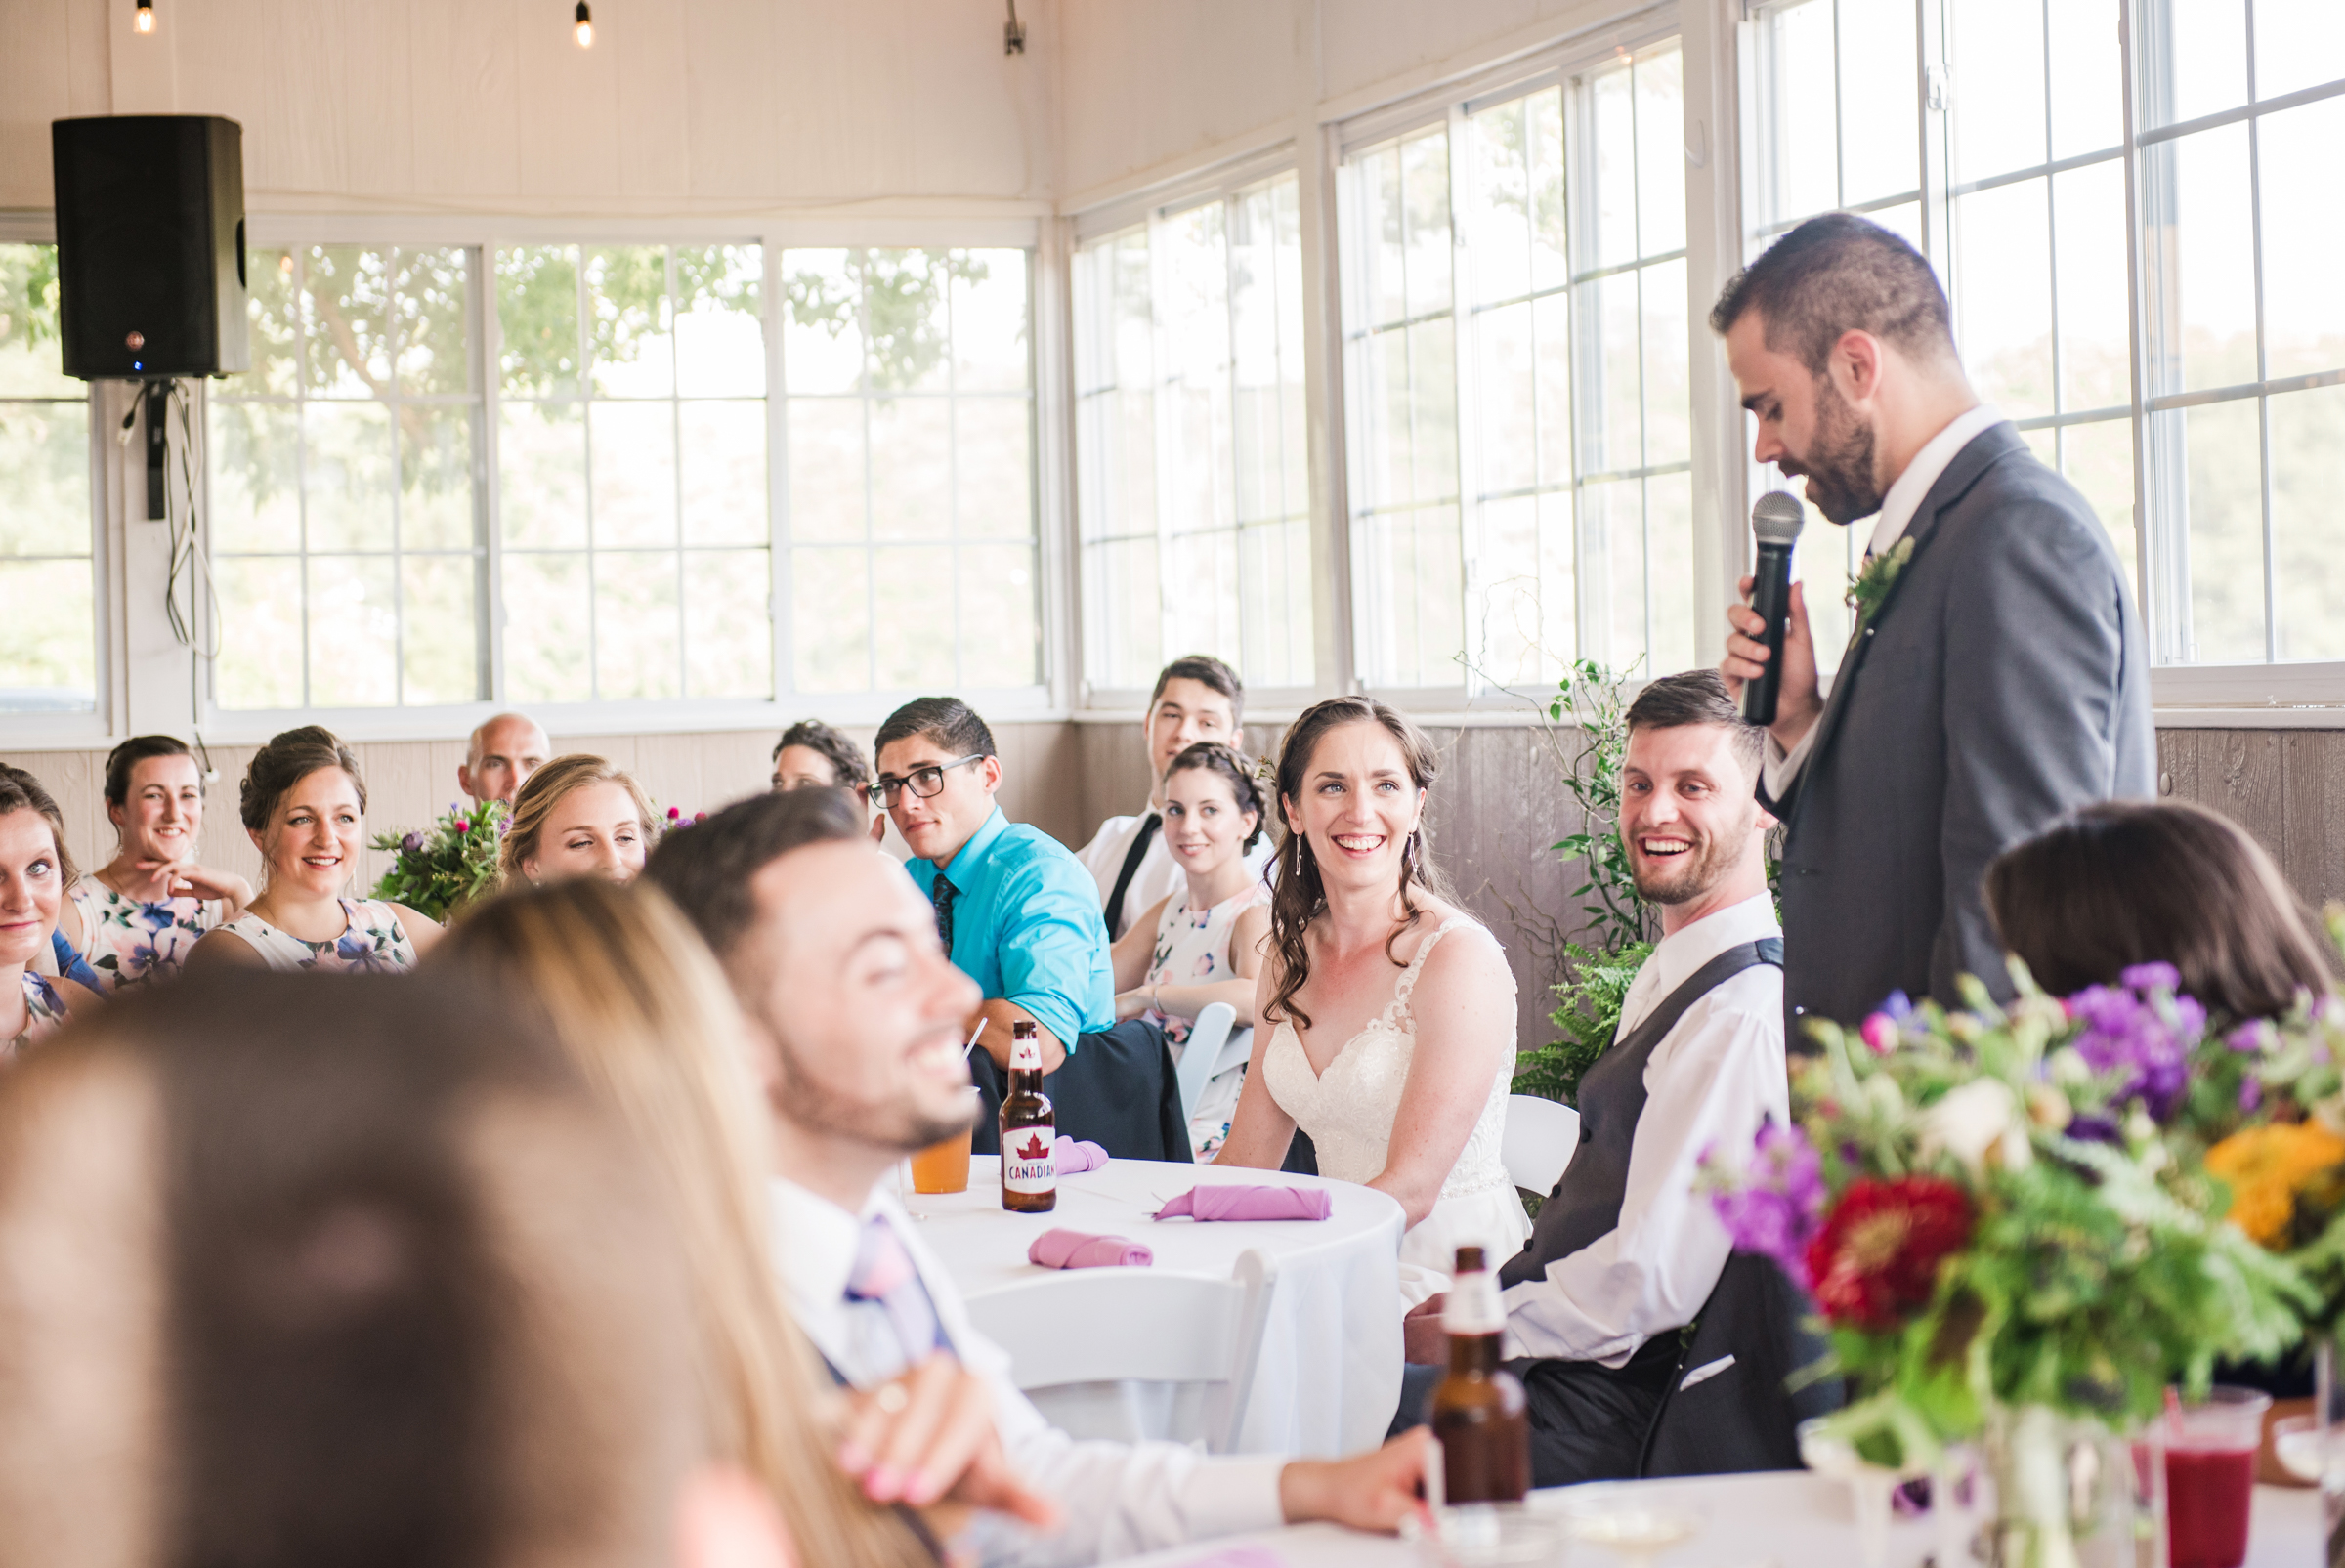 Jerris_Wadsworth_Wedding_Barn_Rochester_Wedding_JILL_STUDIO_Rochester_NY_Photographer_DSC_2890.jpg